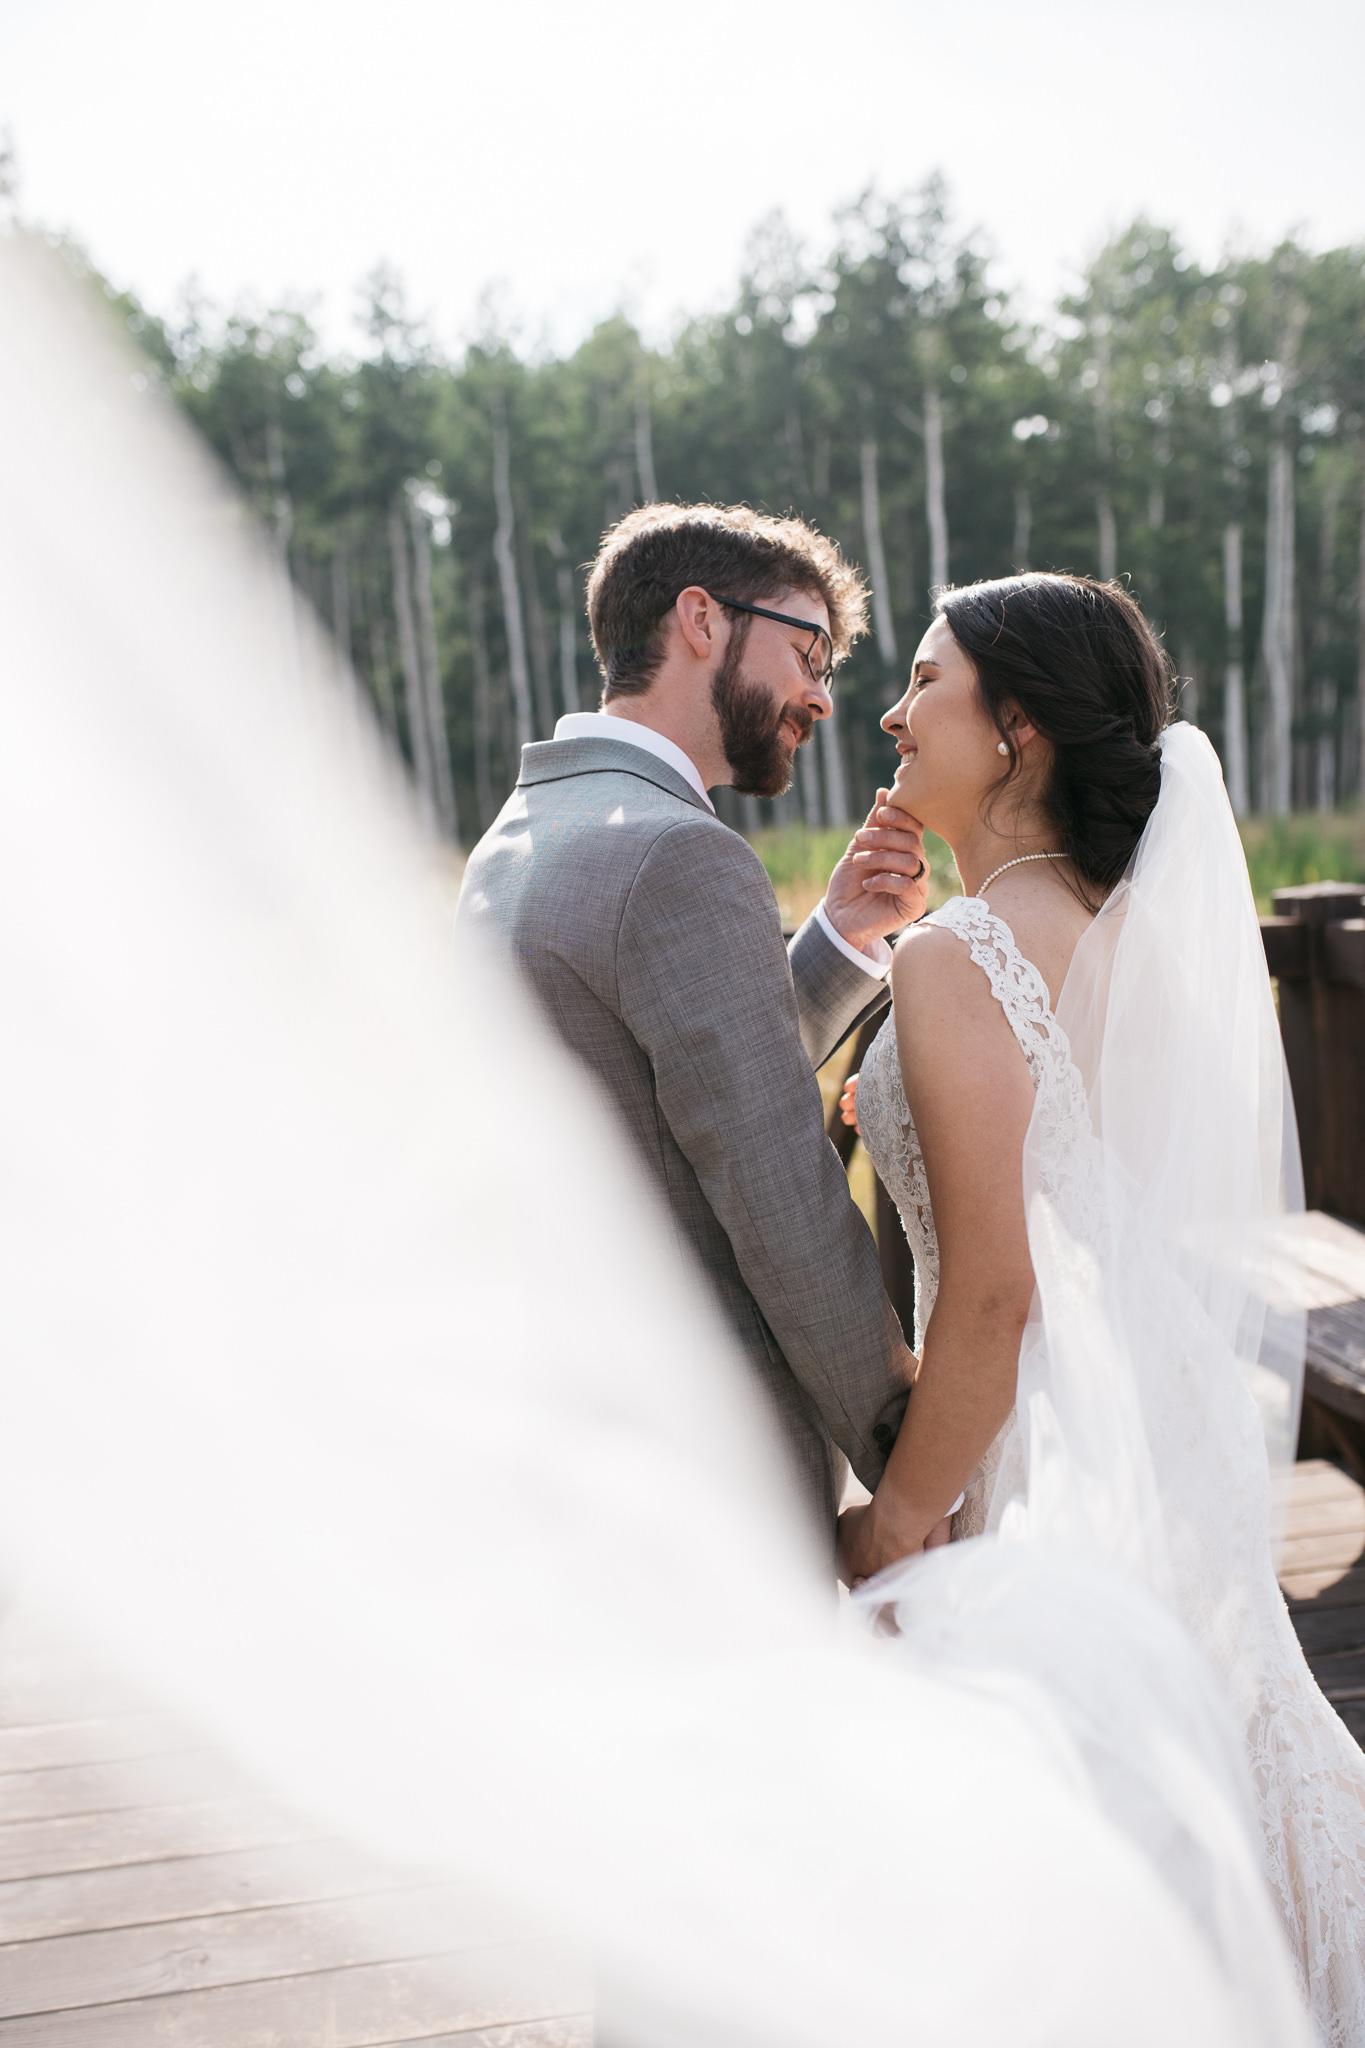 359_ONL_Kat_Nick_Wedding_Trevor_Hooper_Photo.jpg